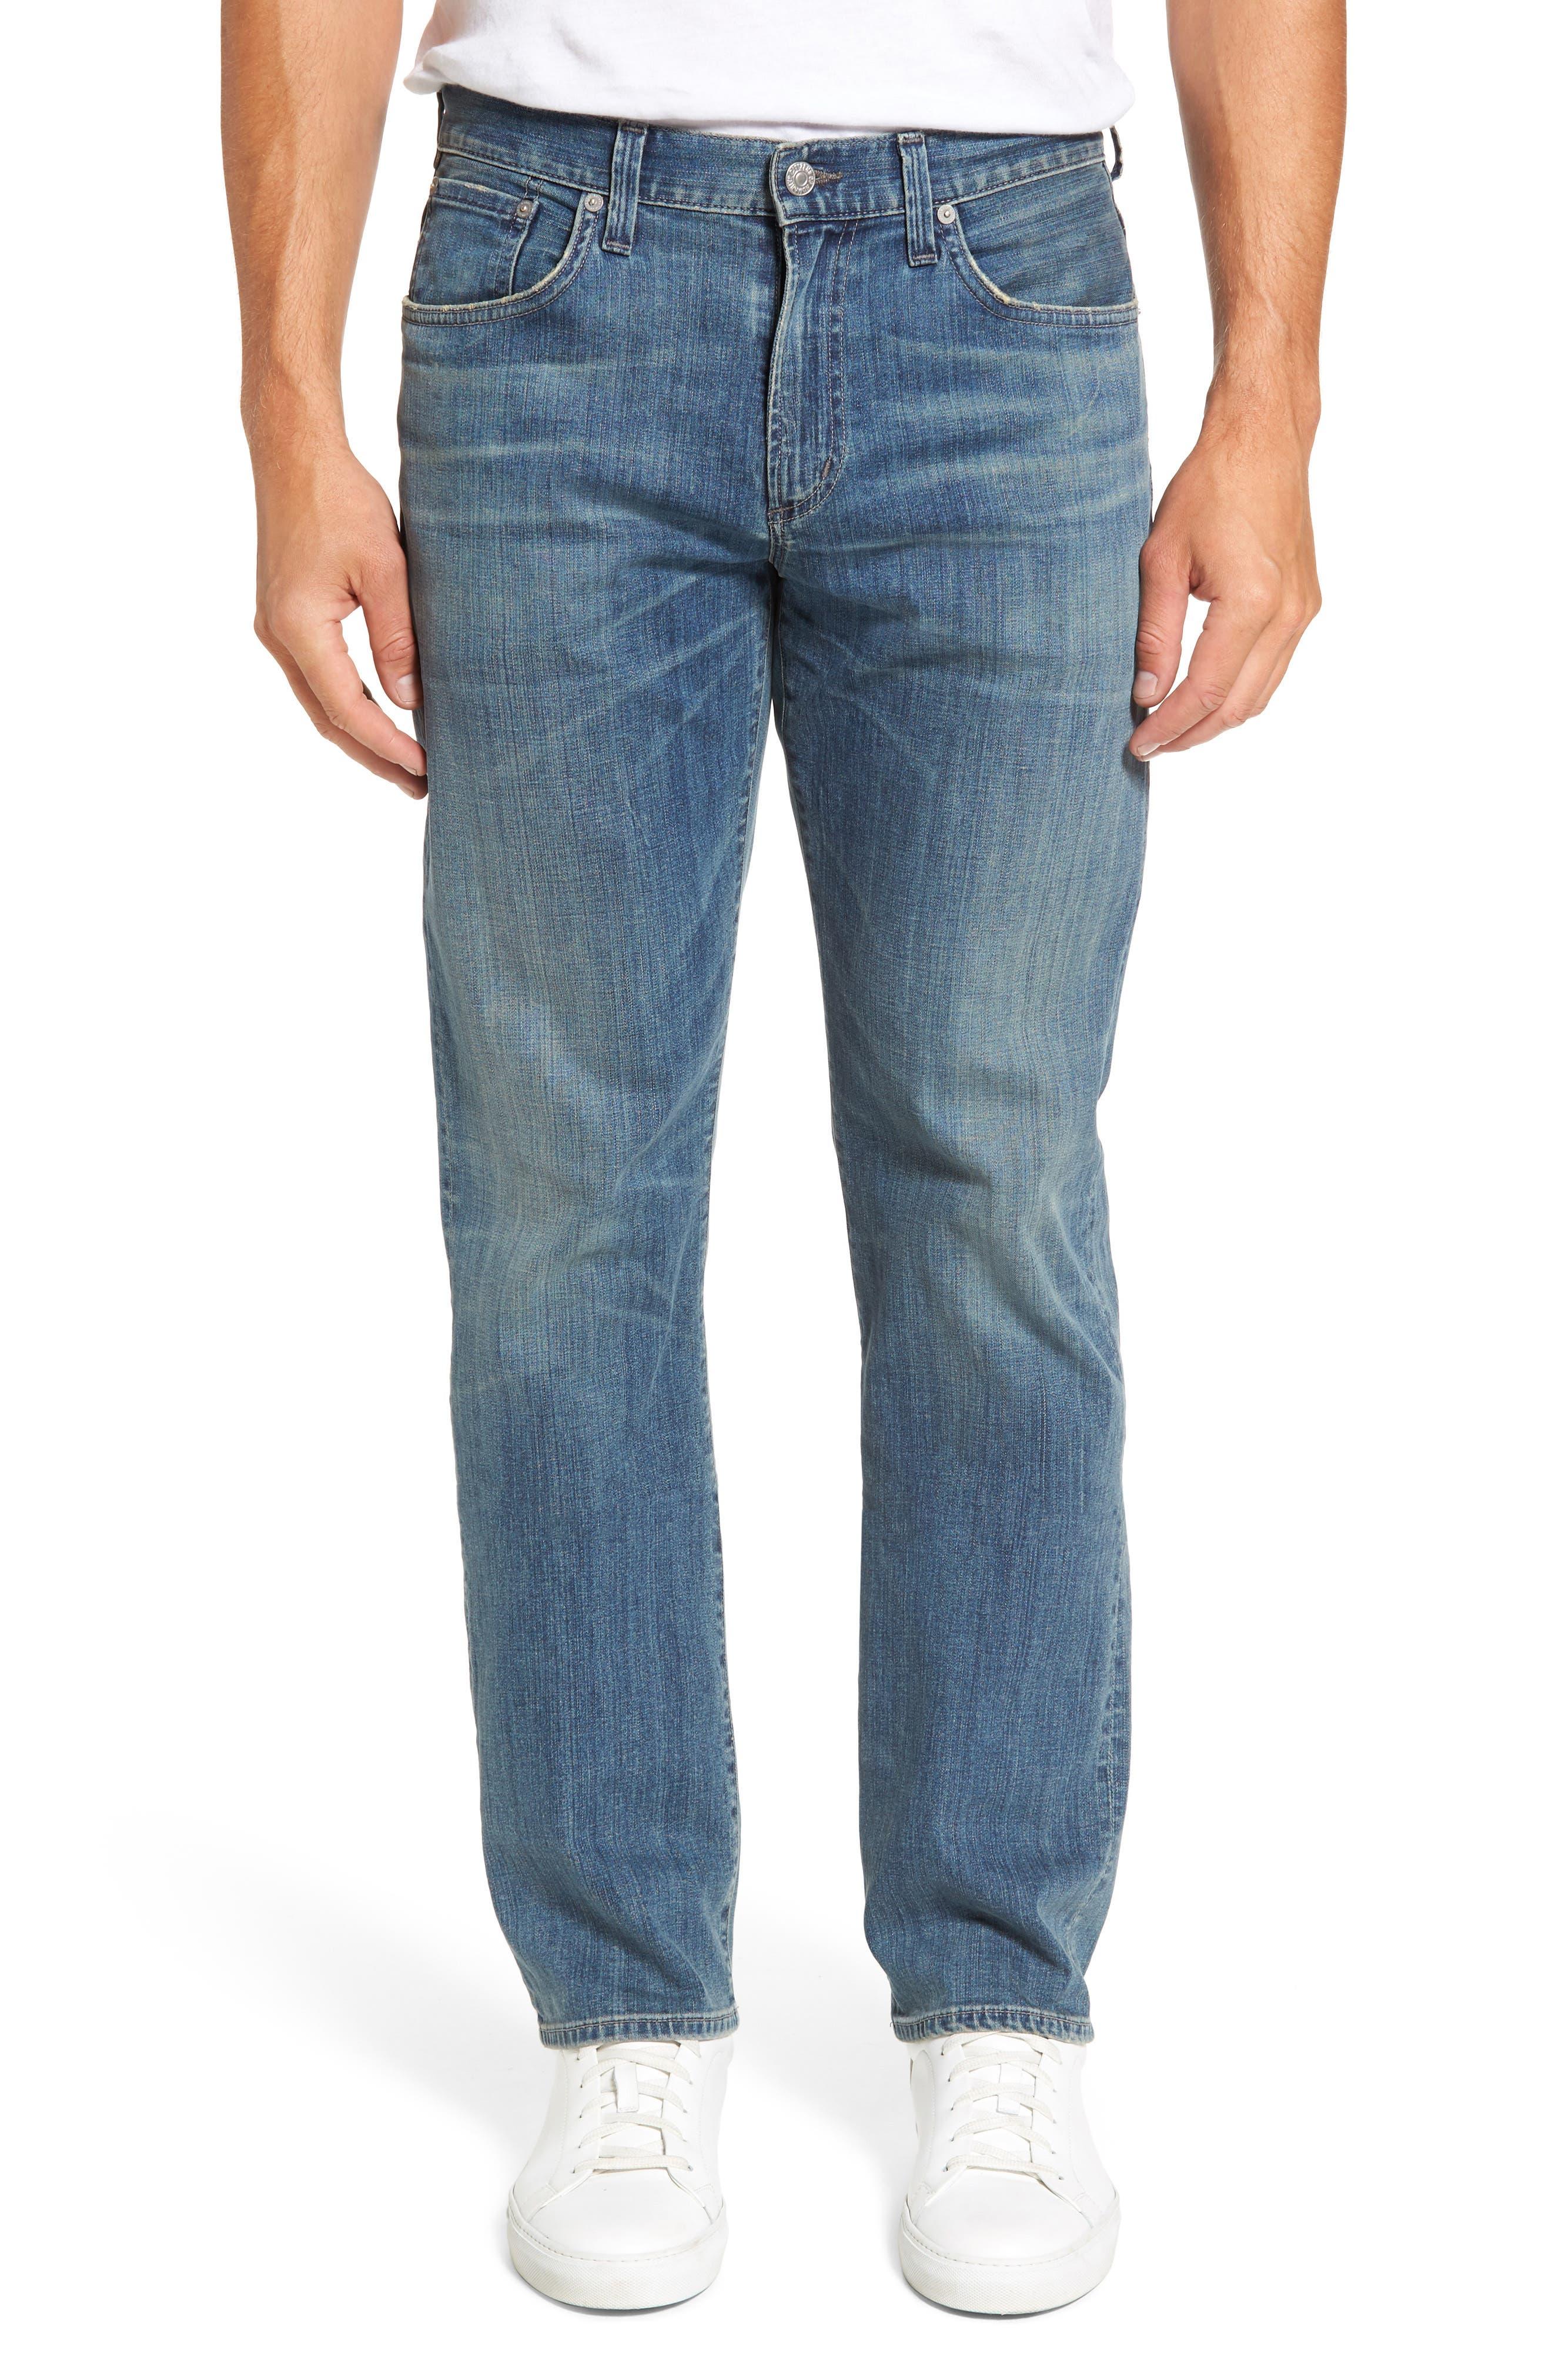 Sid Straight Leg Jeans,                             Main thumbnail 1, color,                             423